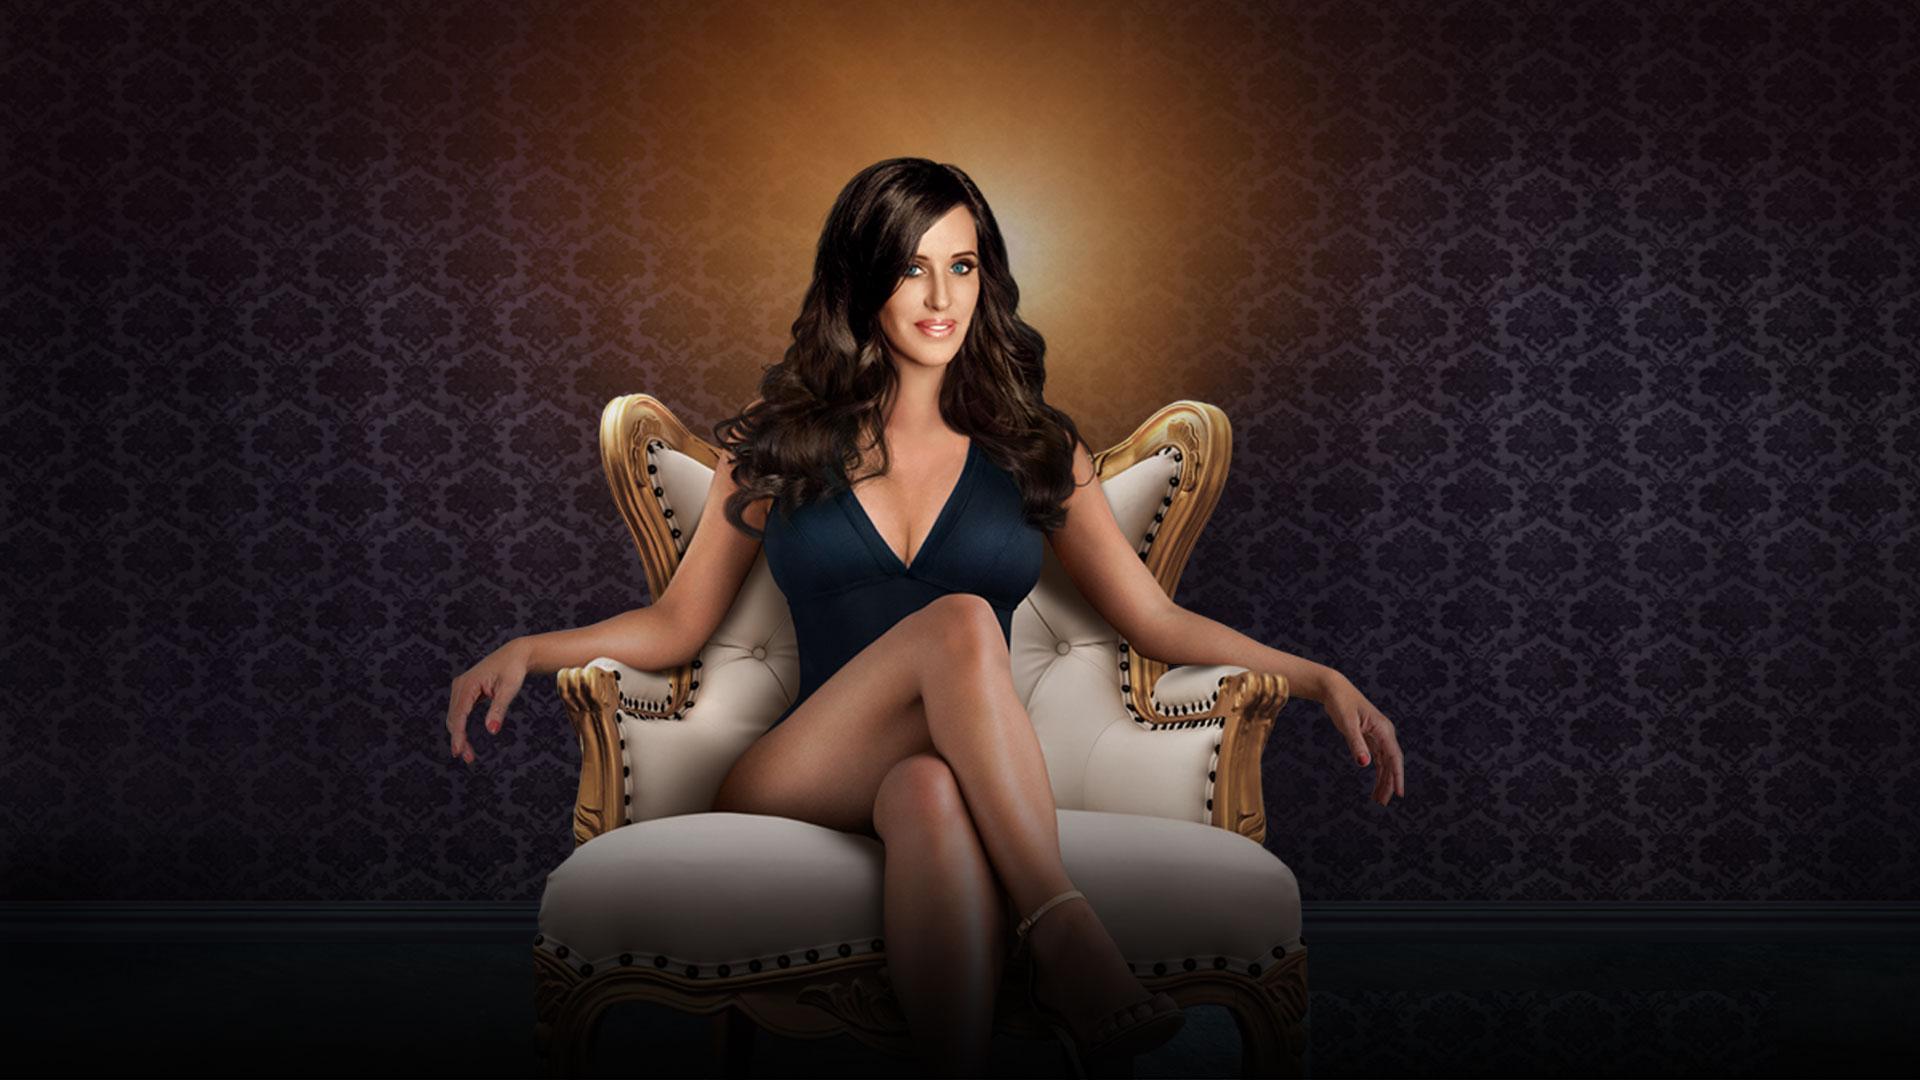 Millionaire matchmaker dating website